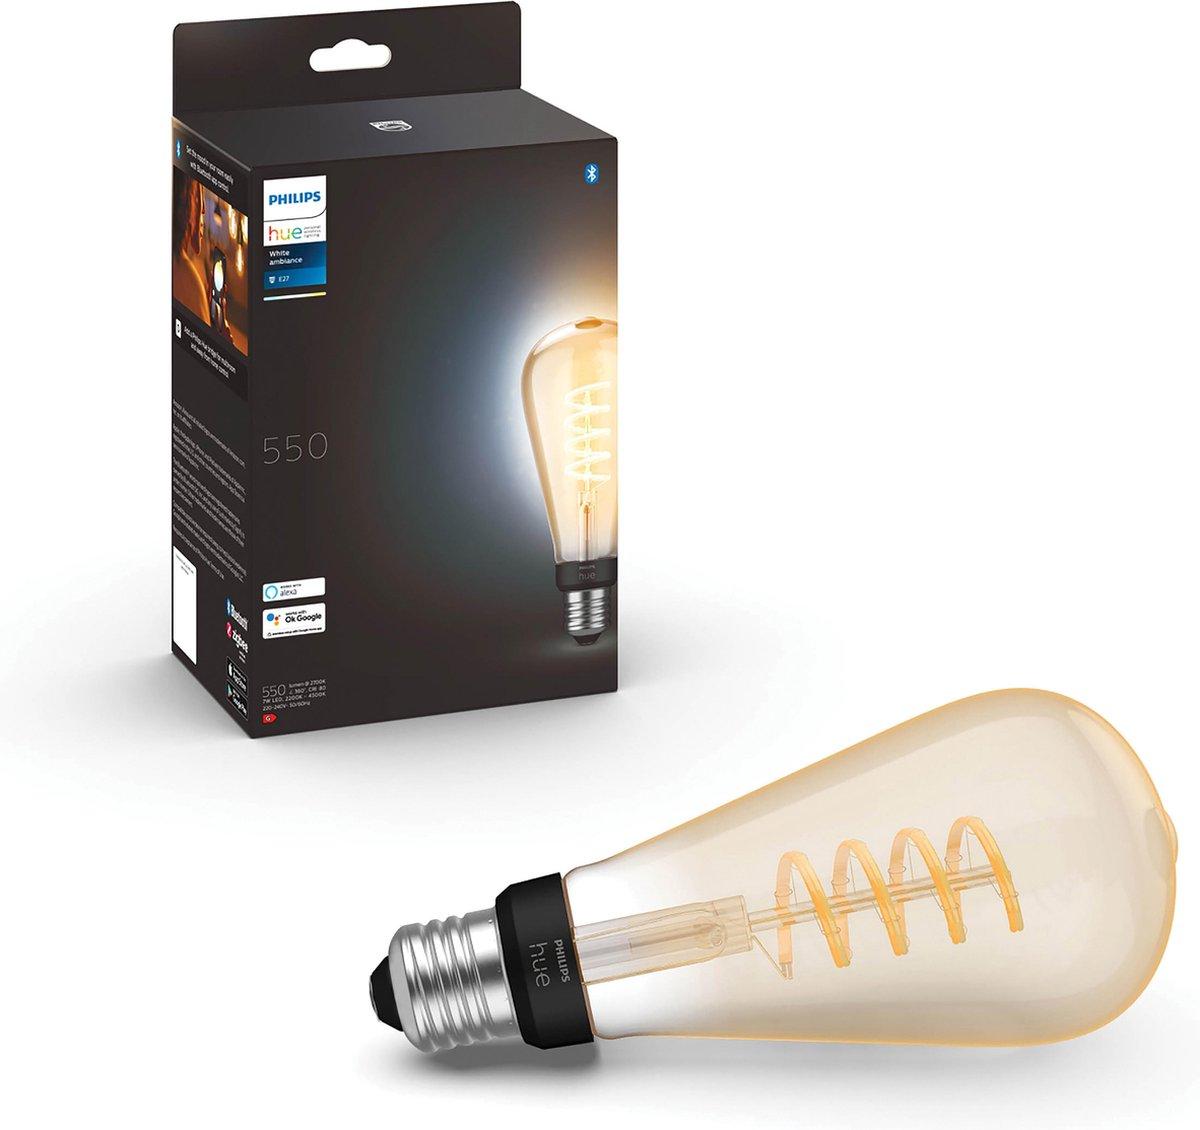 Philips Hue Filament Lichtbron E27 Edisonlamp ST72 - warm tot koelwit licht - groot - 1-pack - Bluetooth